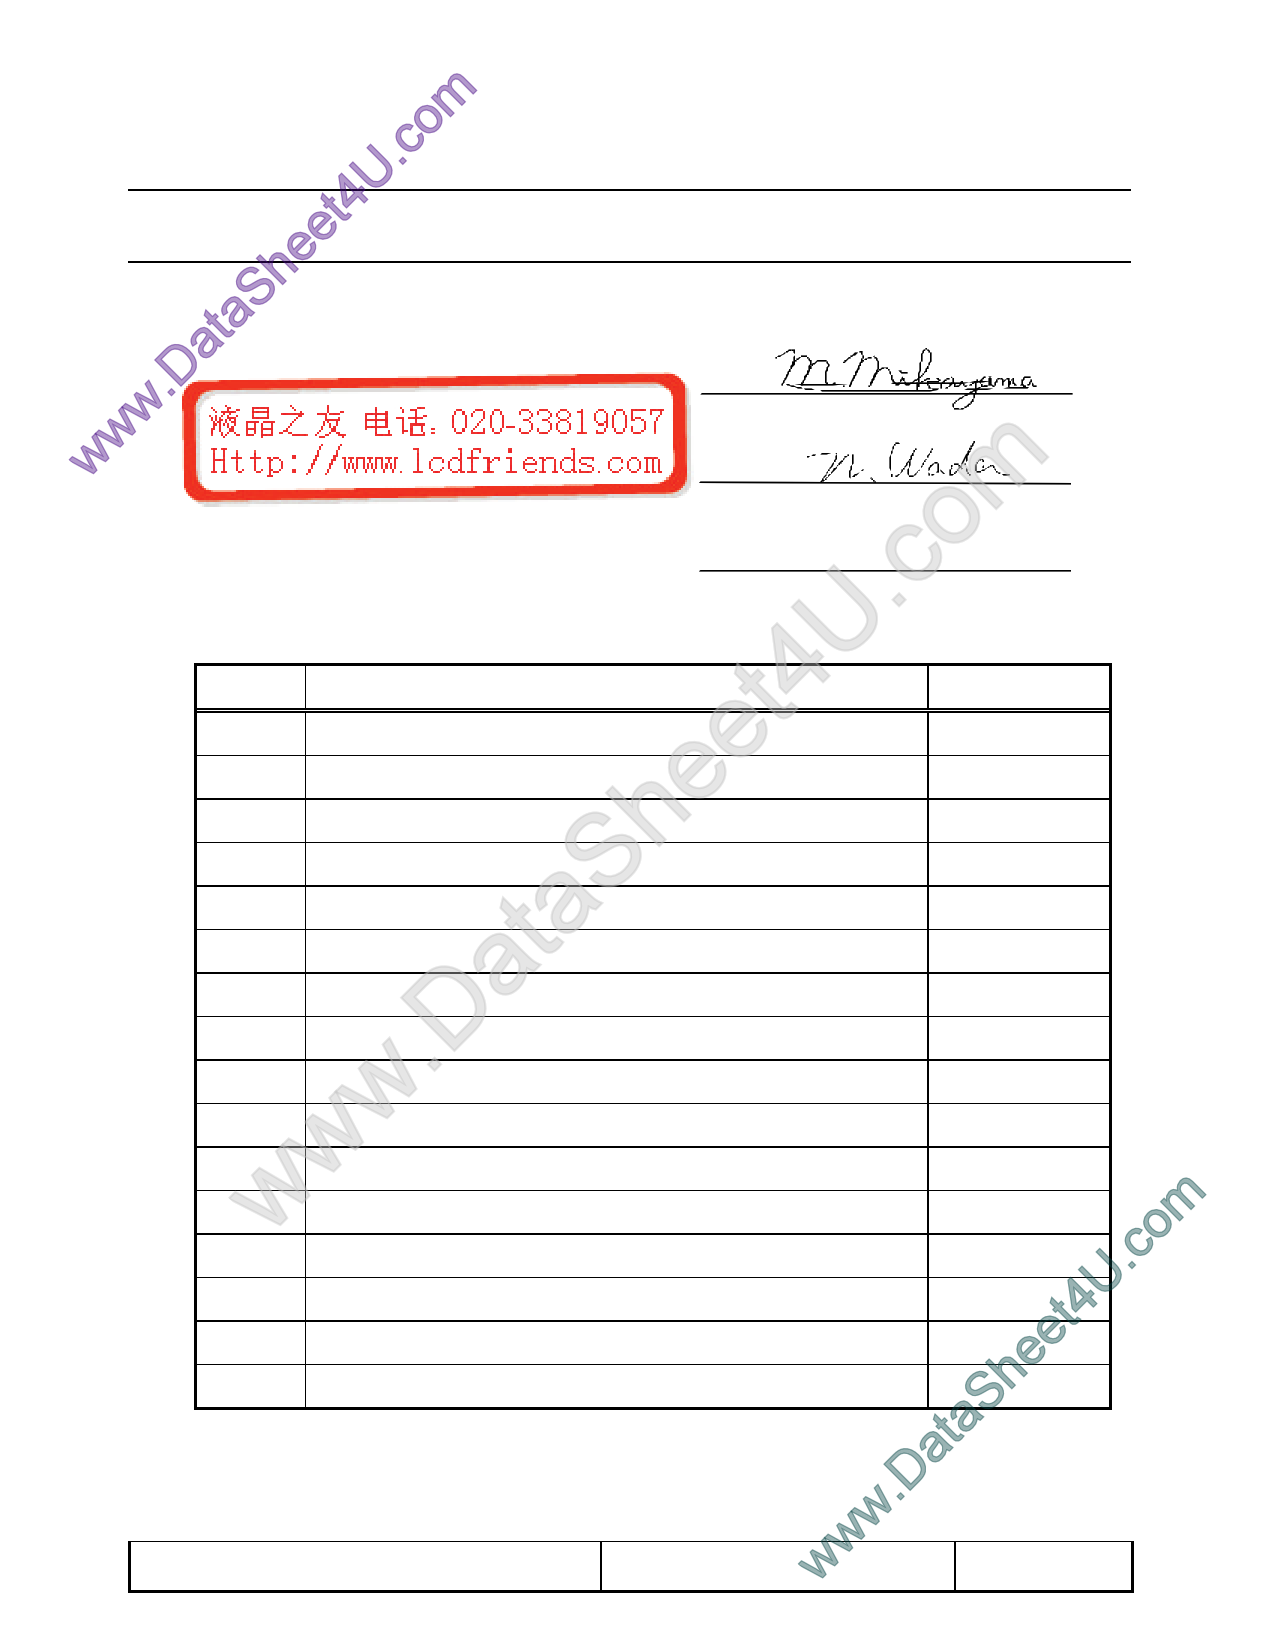 T-51866D121J-FW-A-AA دیتاشیت PDF